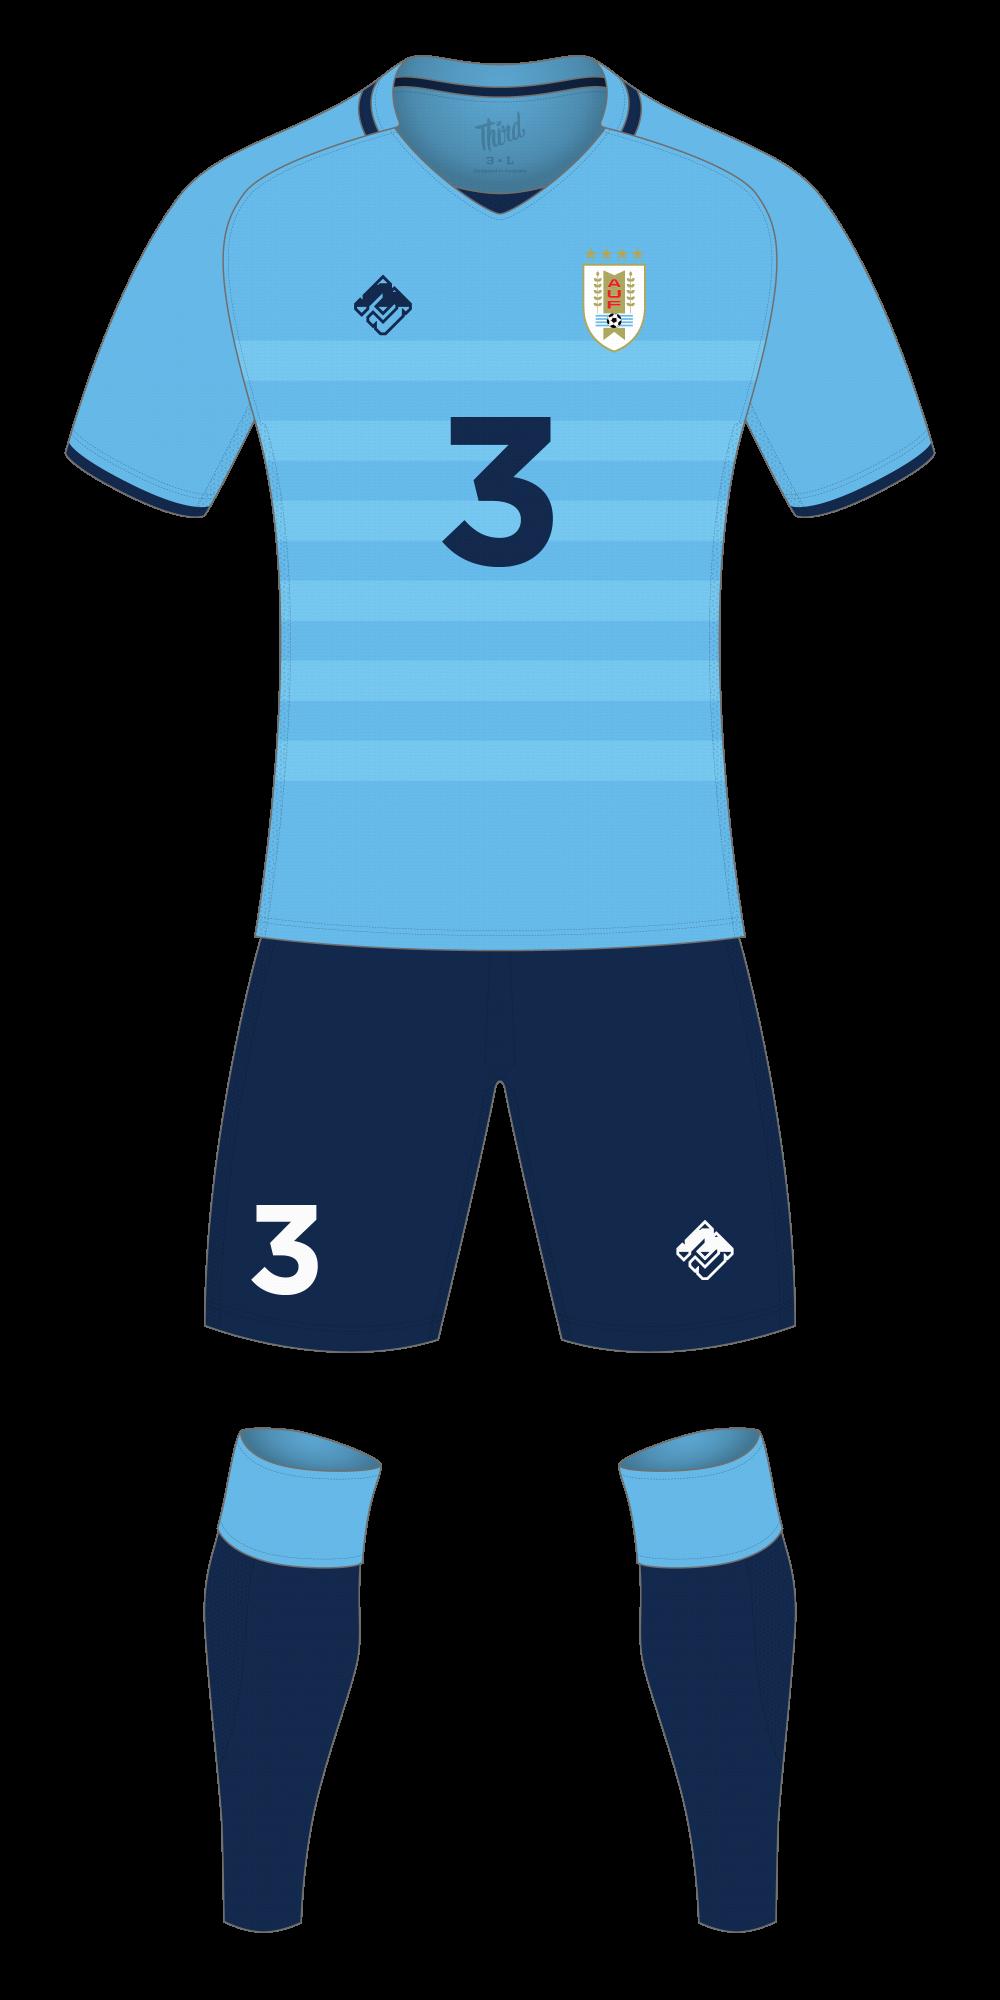 Uruguay World Cup 2018 concept